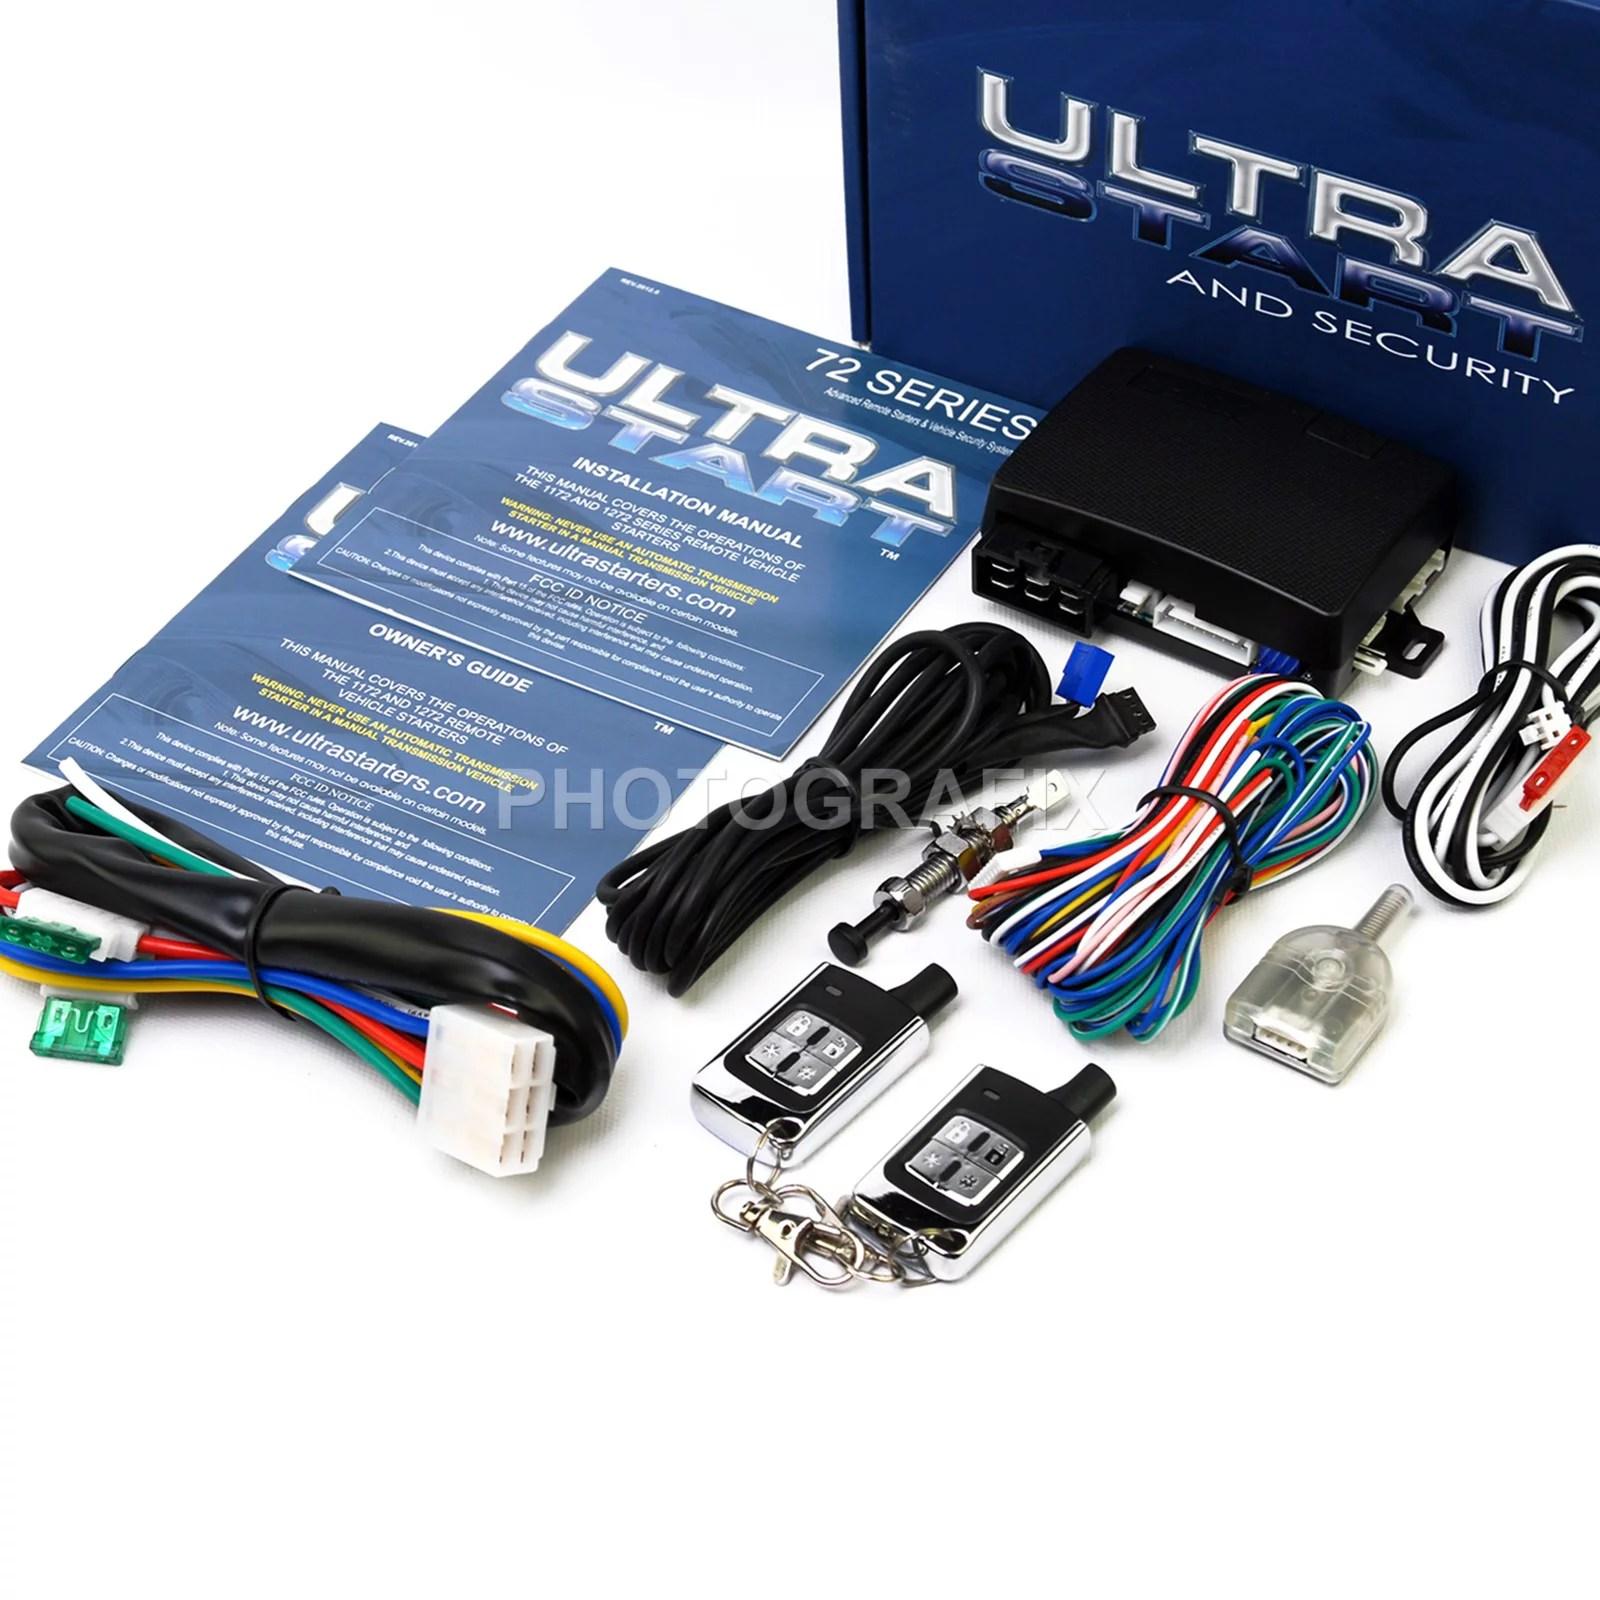 ultra start 1272 xr pro keyless auto remote car start starter diagrams start wiring remote oltrastart [ 1600 x 1600 Pixel ]